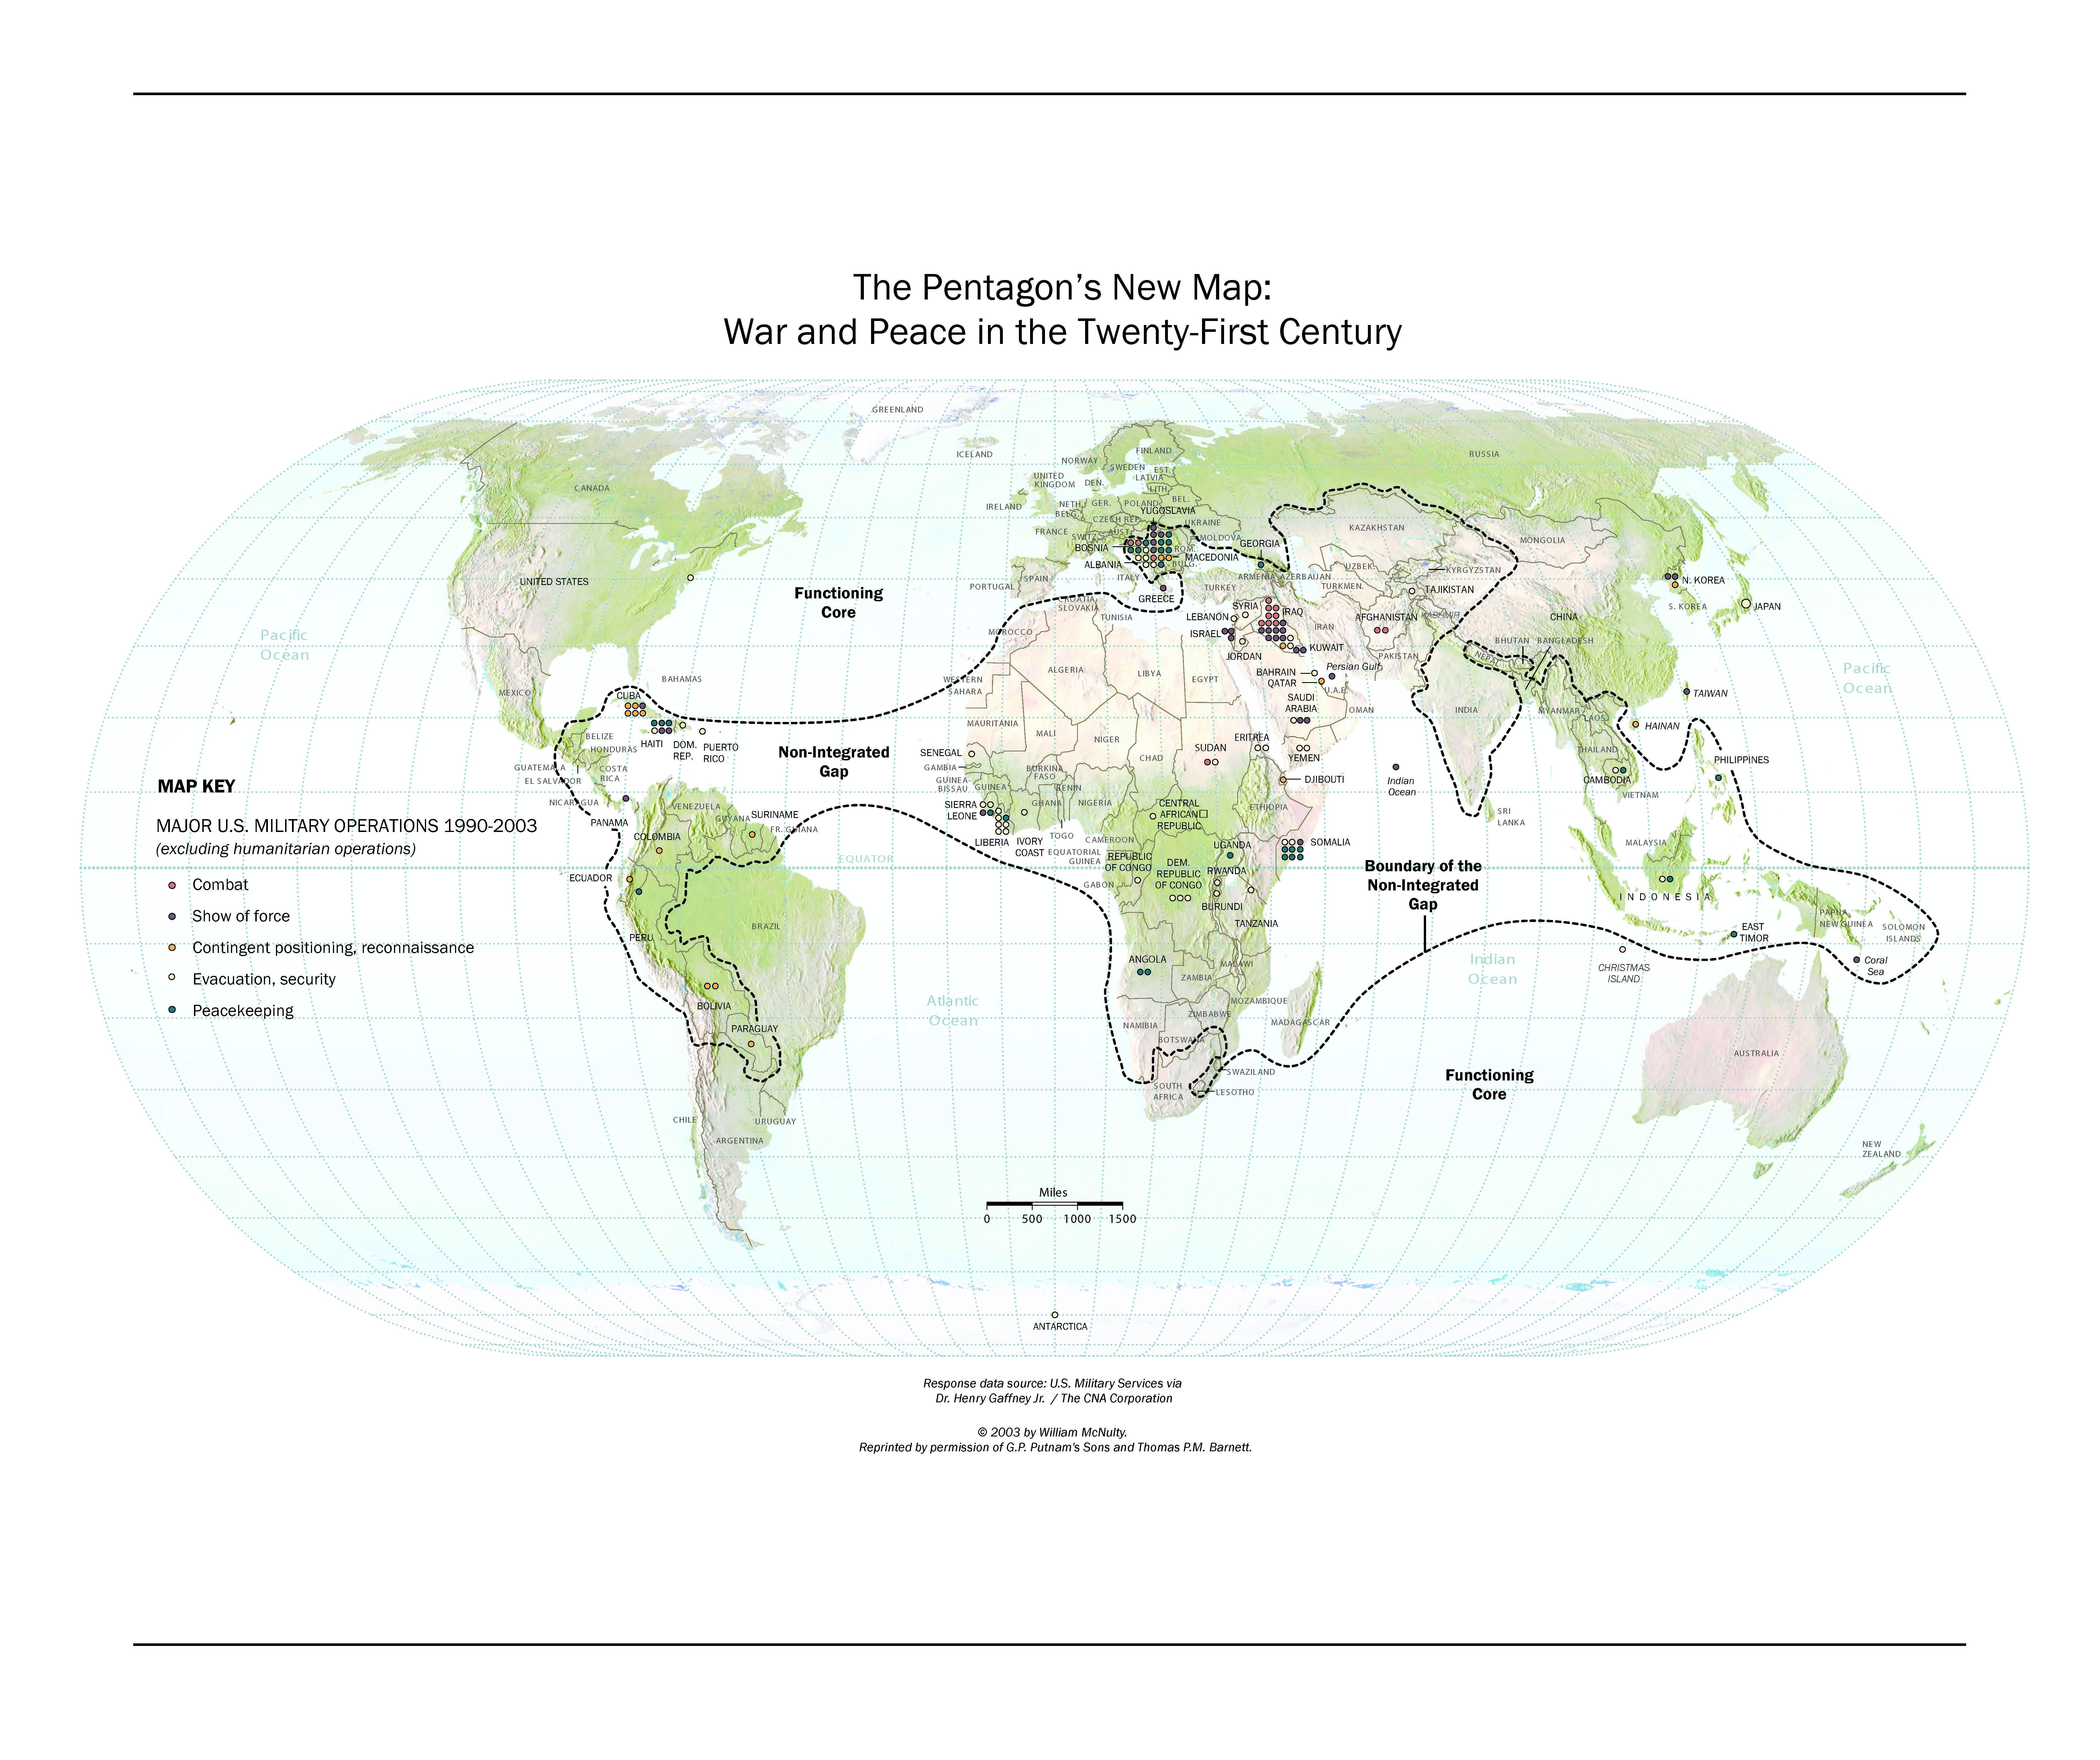 pentagono division del mundo jpg